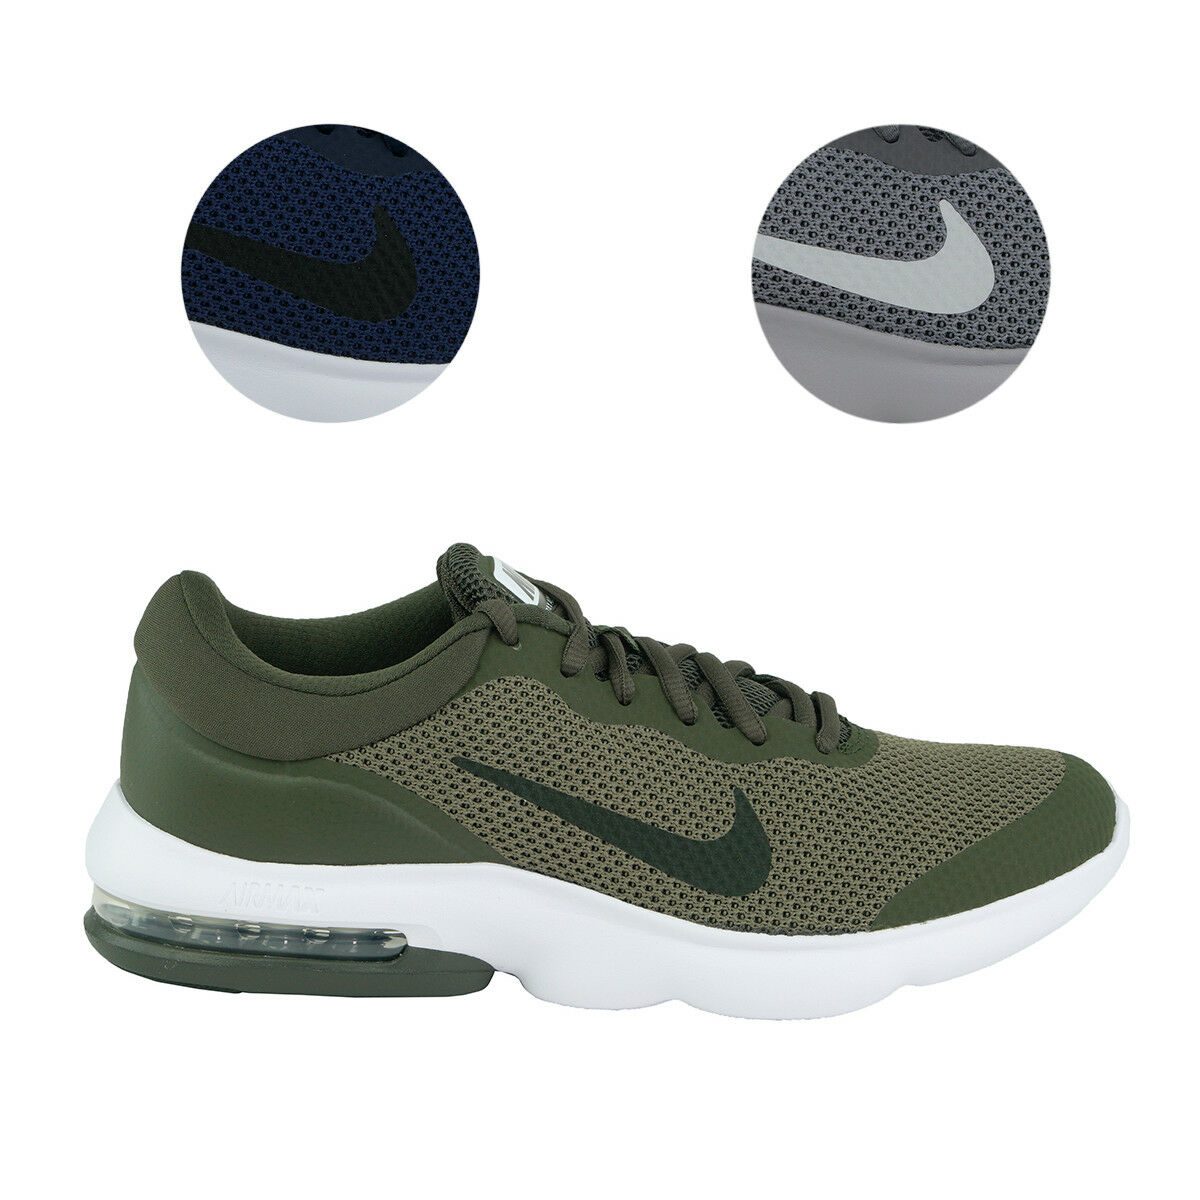 Zapatillas Nike Air Max Advantage Hombre 13 Us 31 Cm